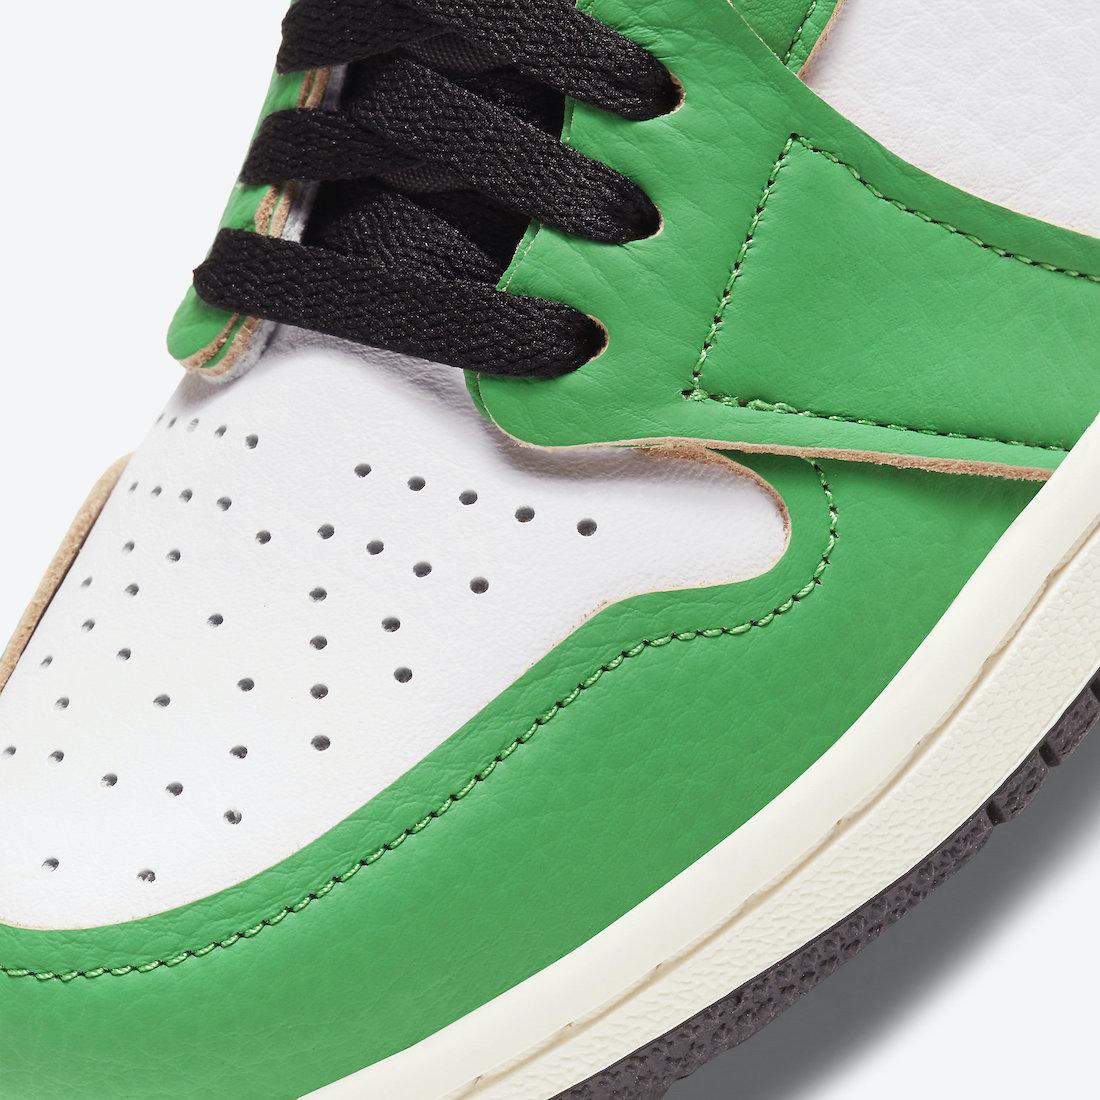 Air Jordan 1 'Lucky Green' DB4612-300 6